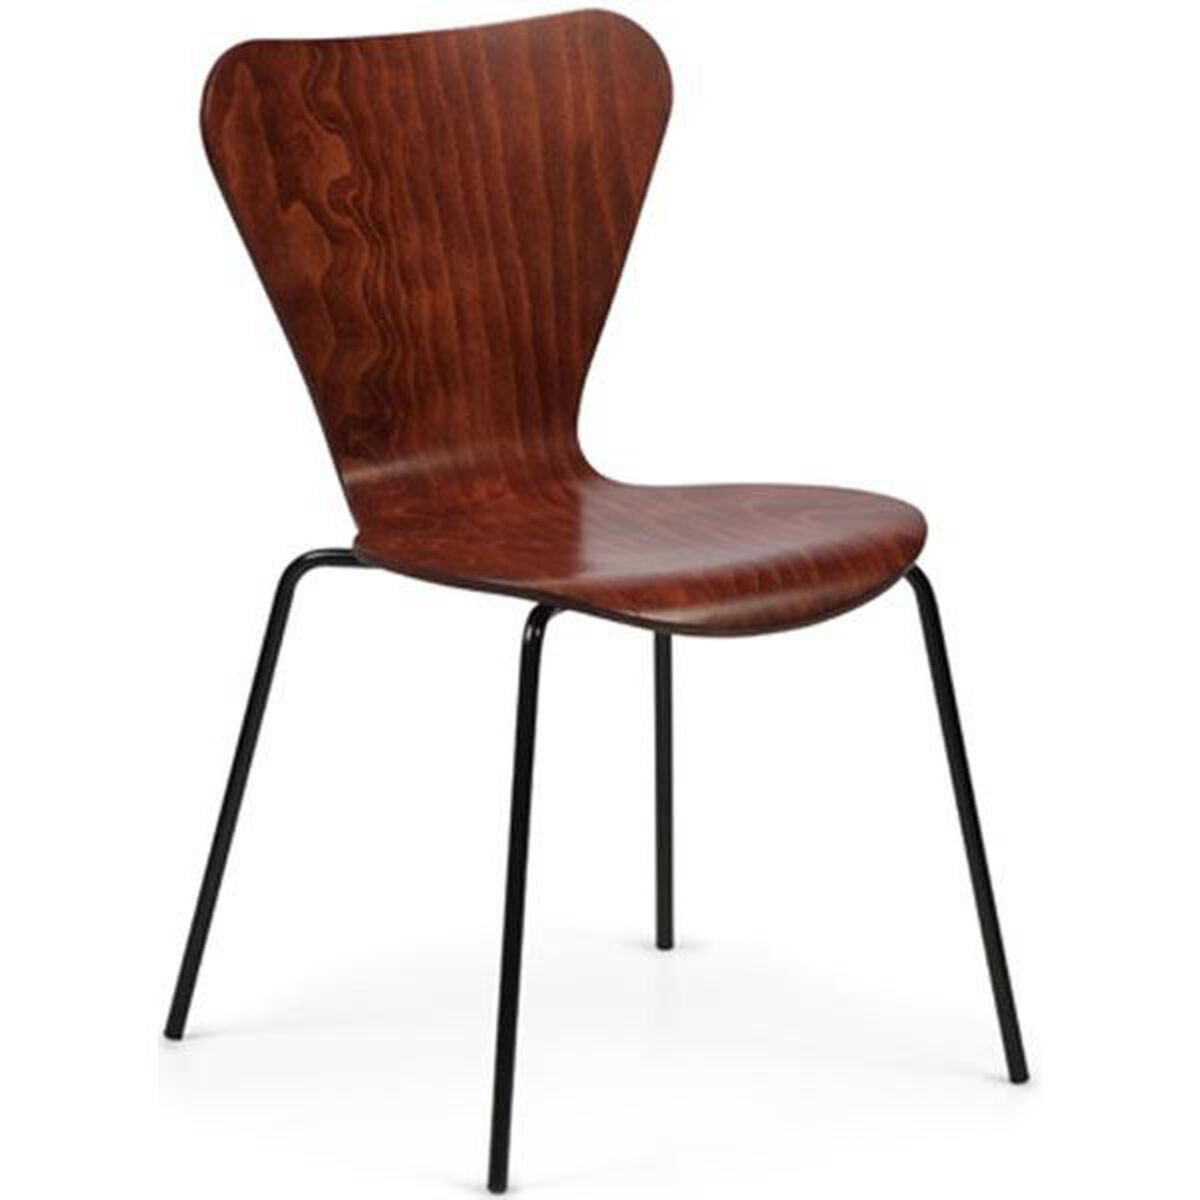 Art Design International Clover Steel Frame Stacking Chair